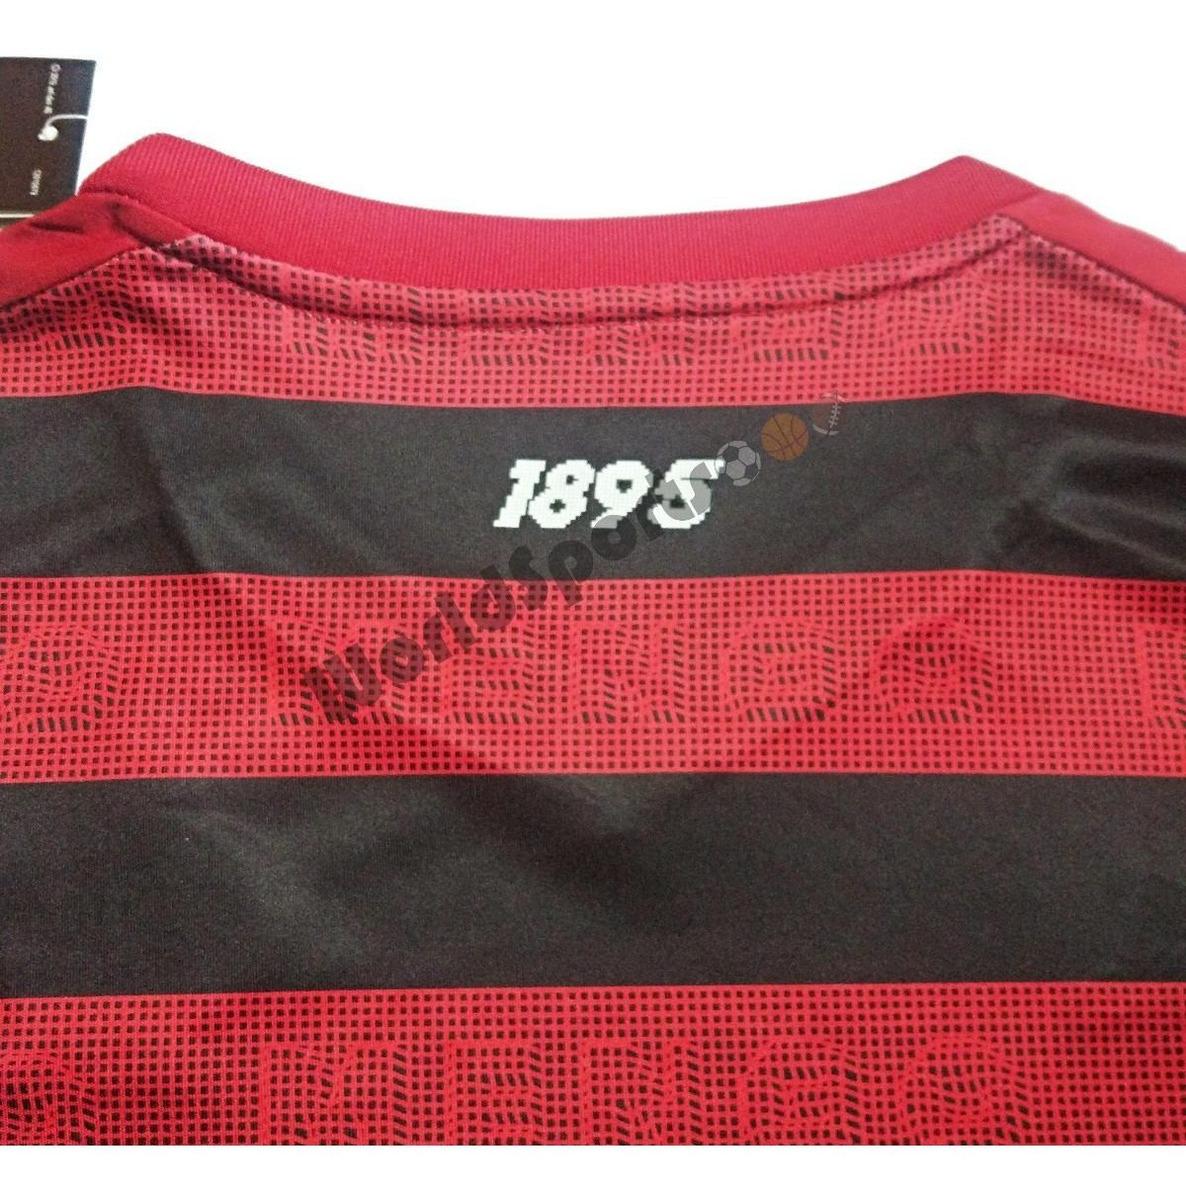 2ffa7a13ed Nova Camisa Flamengo Feminina 18/19 - Envio Imediato - R$ 119,99 em ...